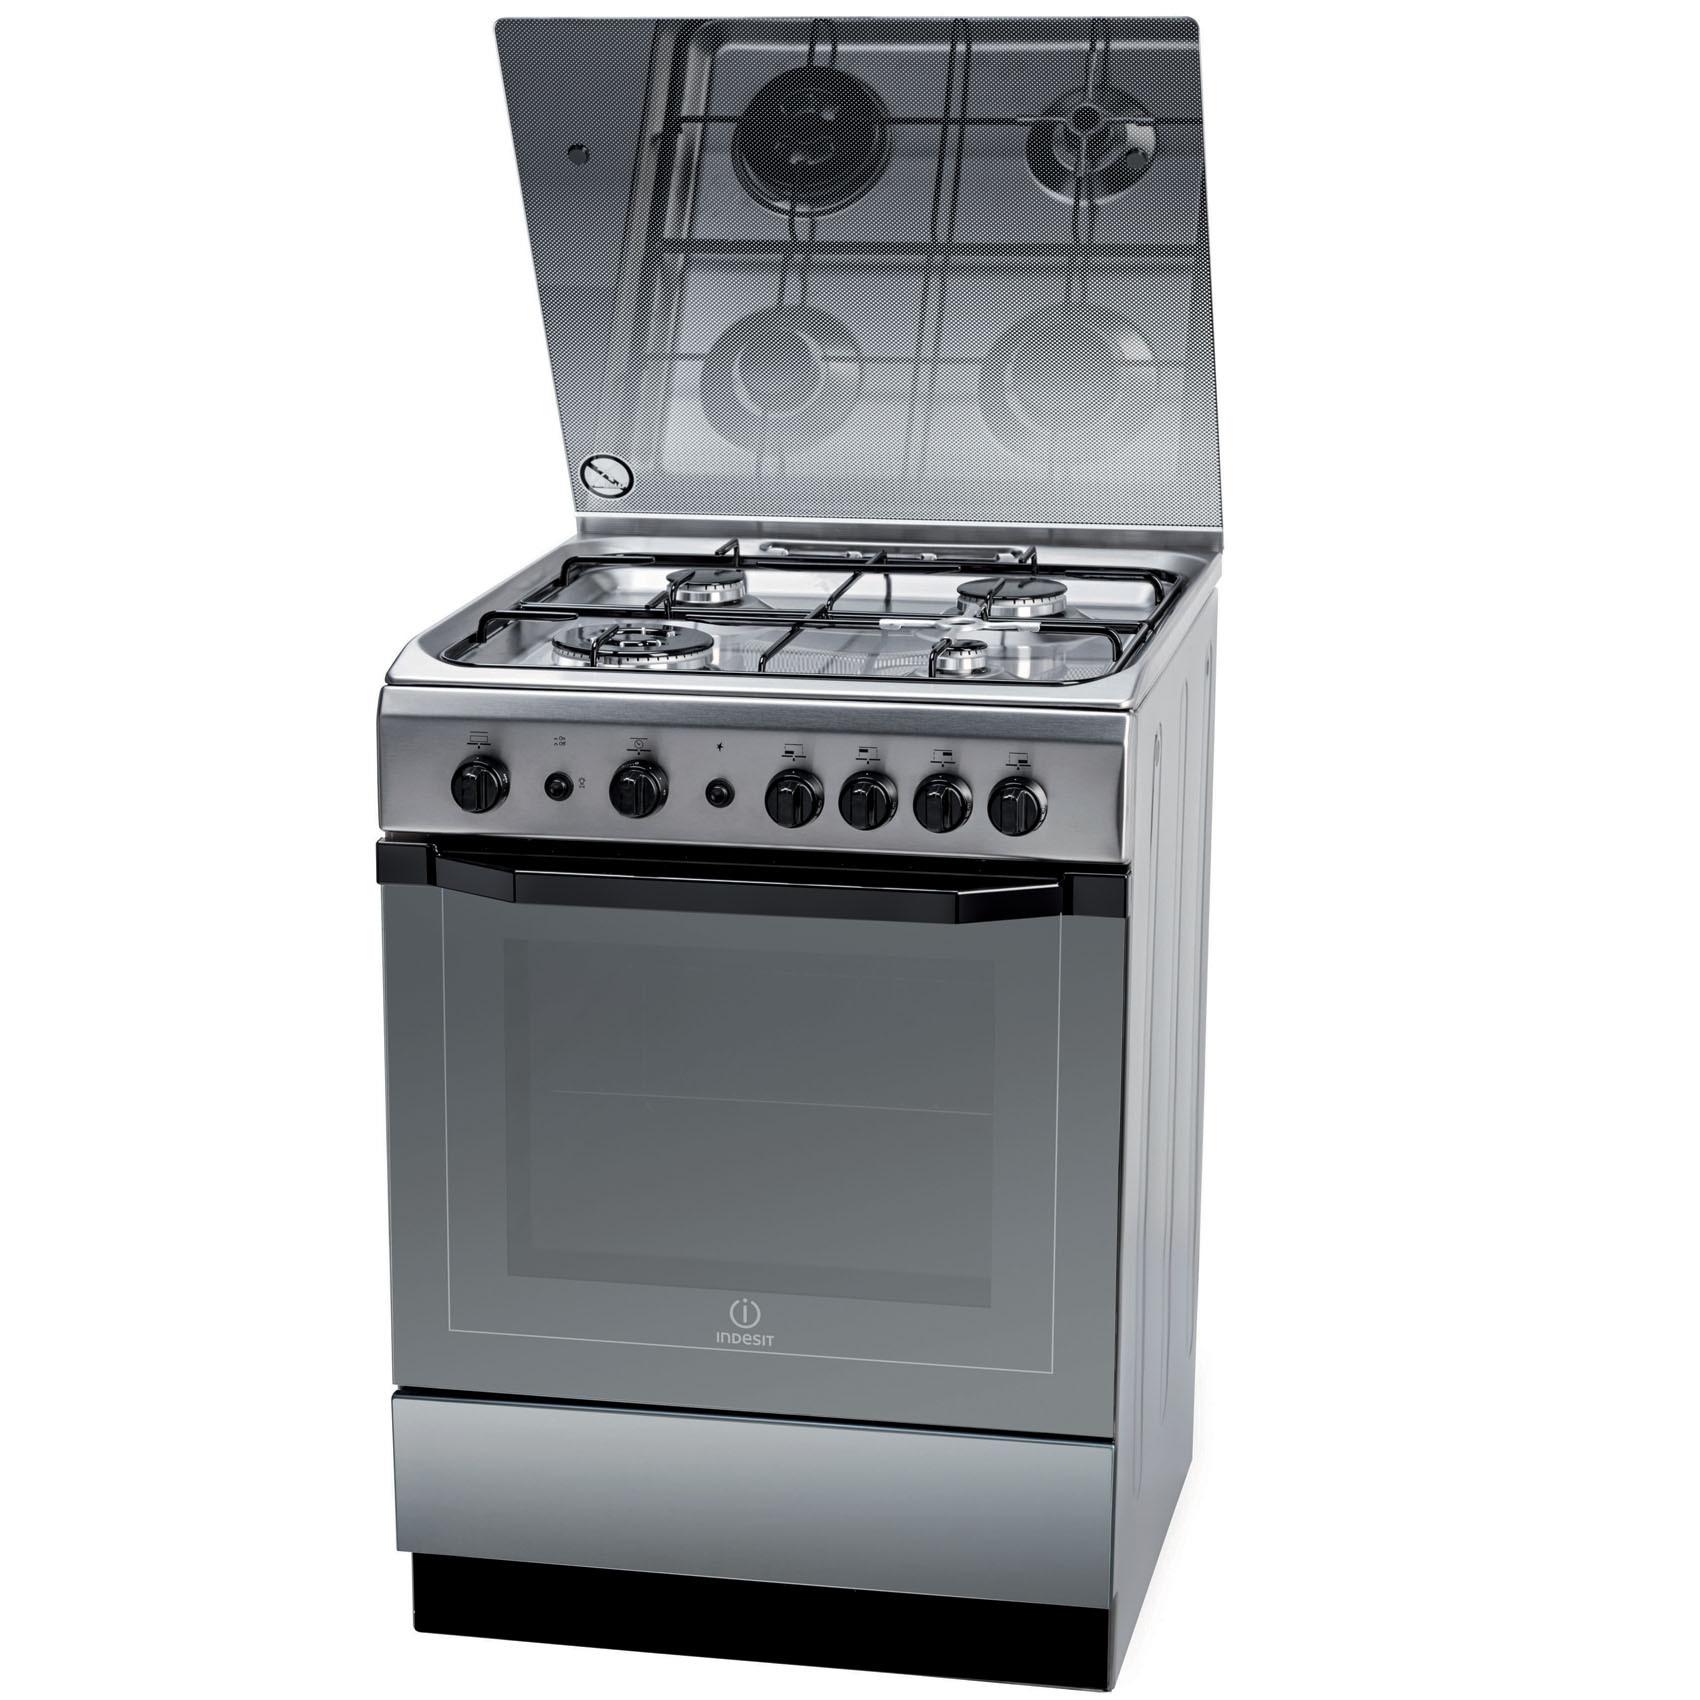 INDESIT COOKER I6TG1GKXEX 60X60CM